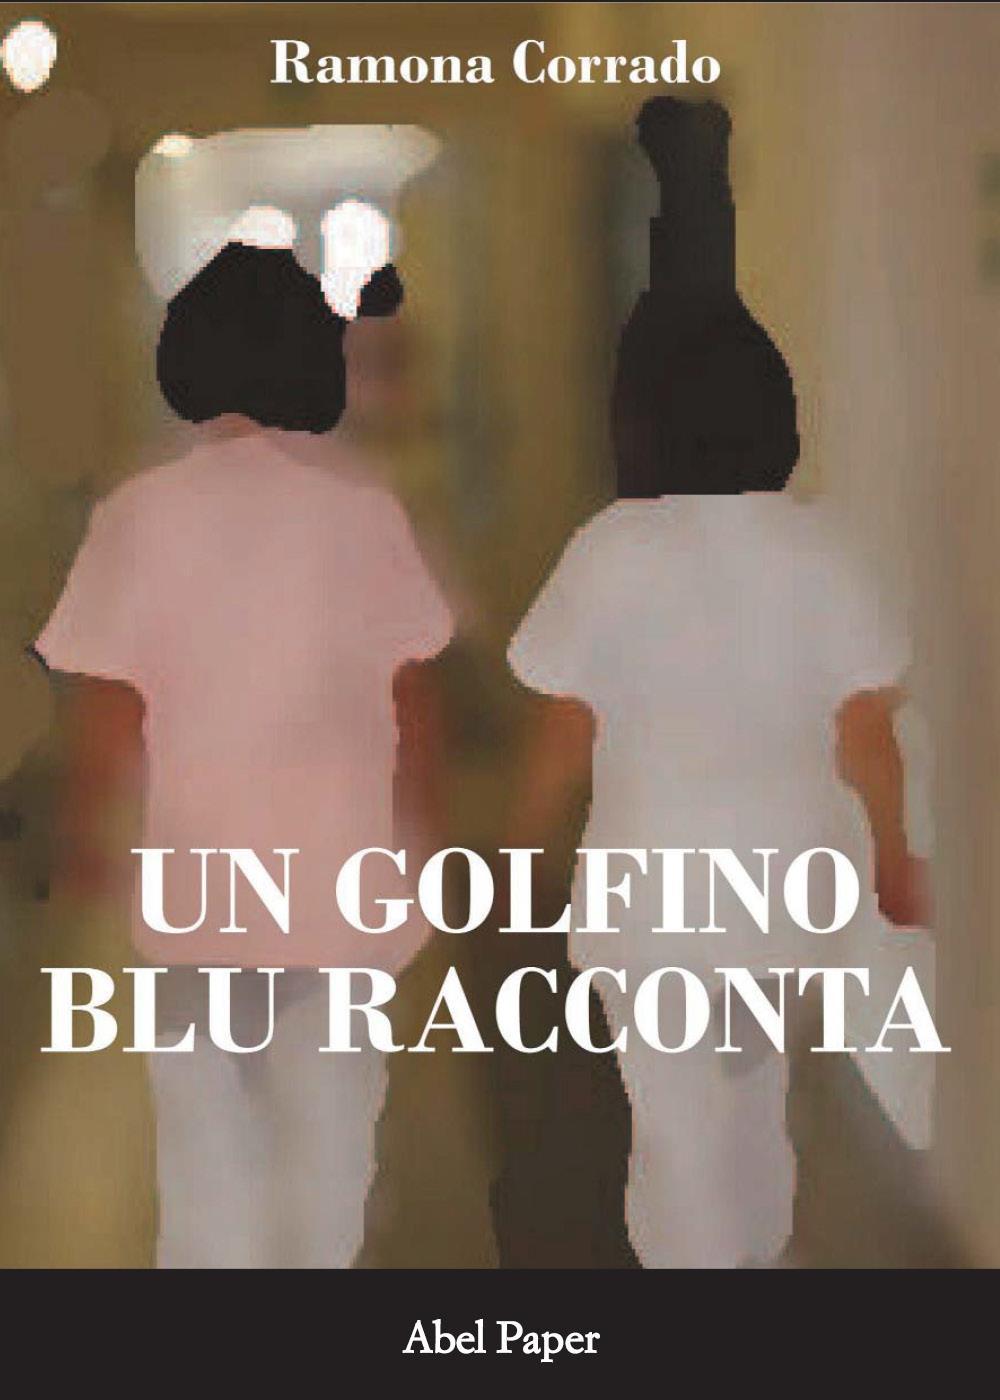 Un golfino blu racconta